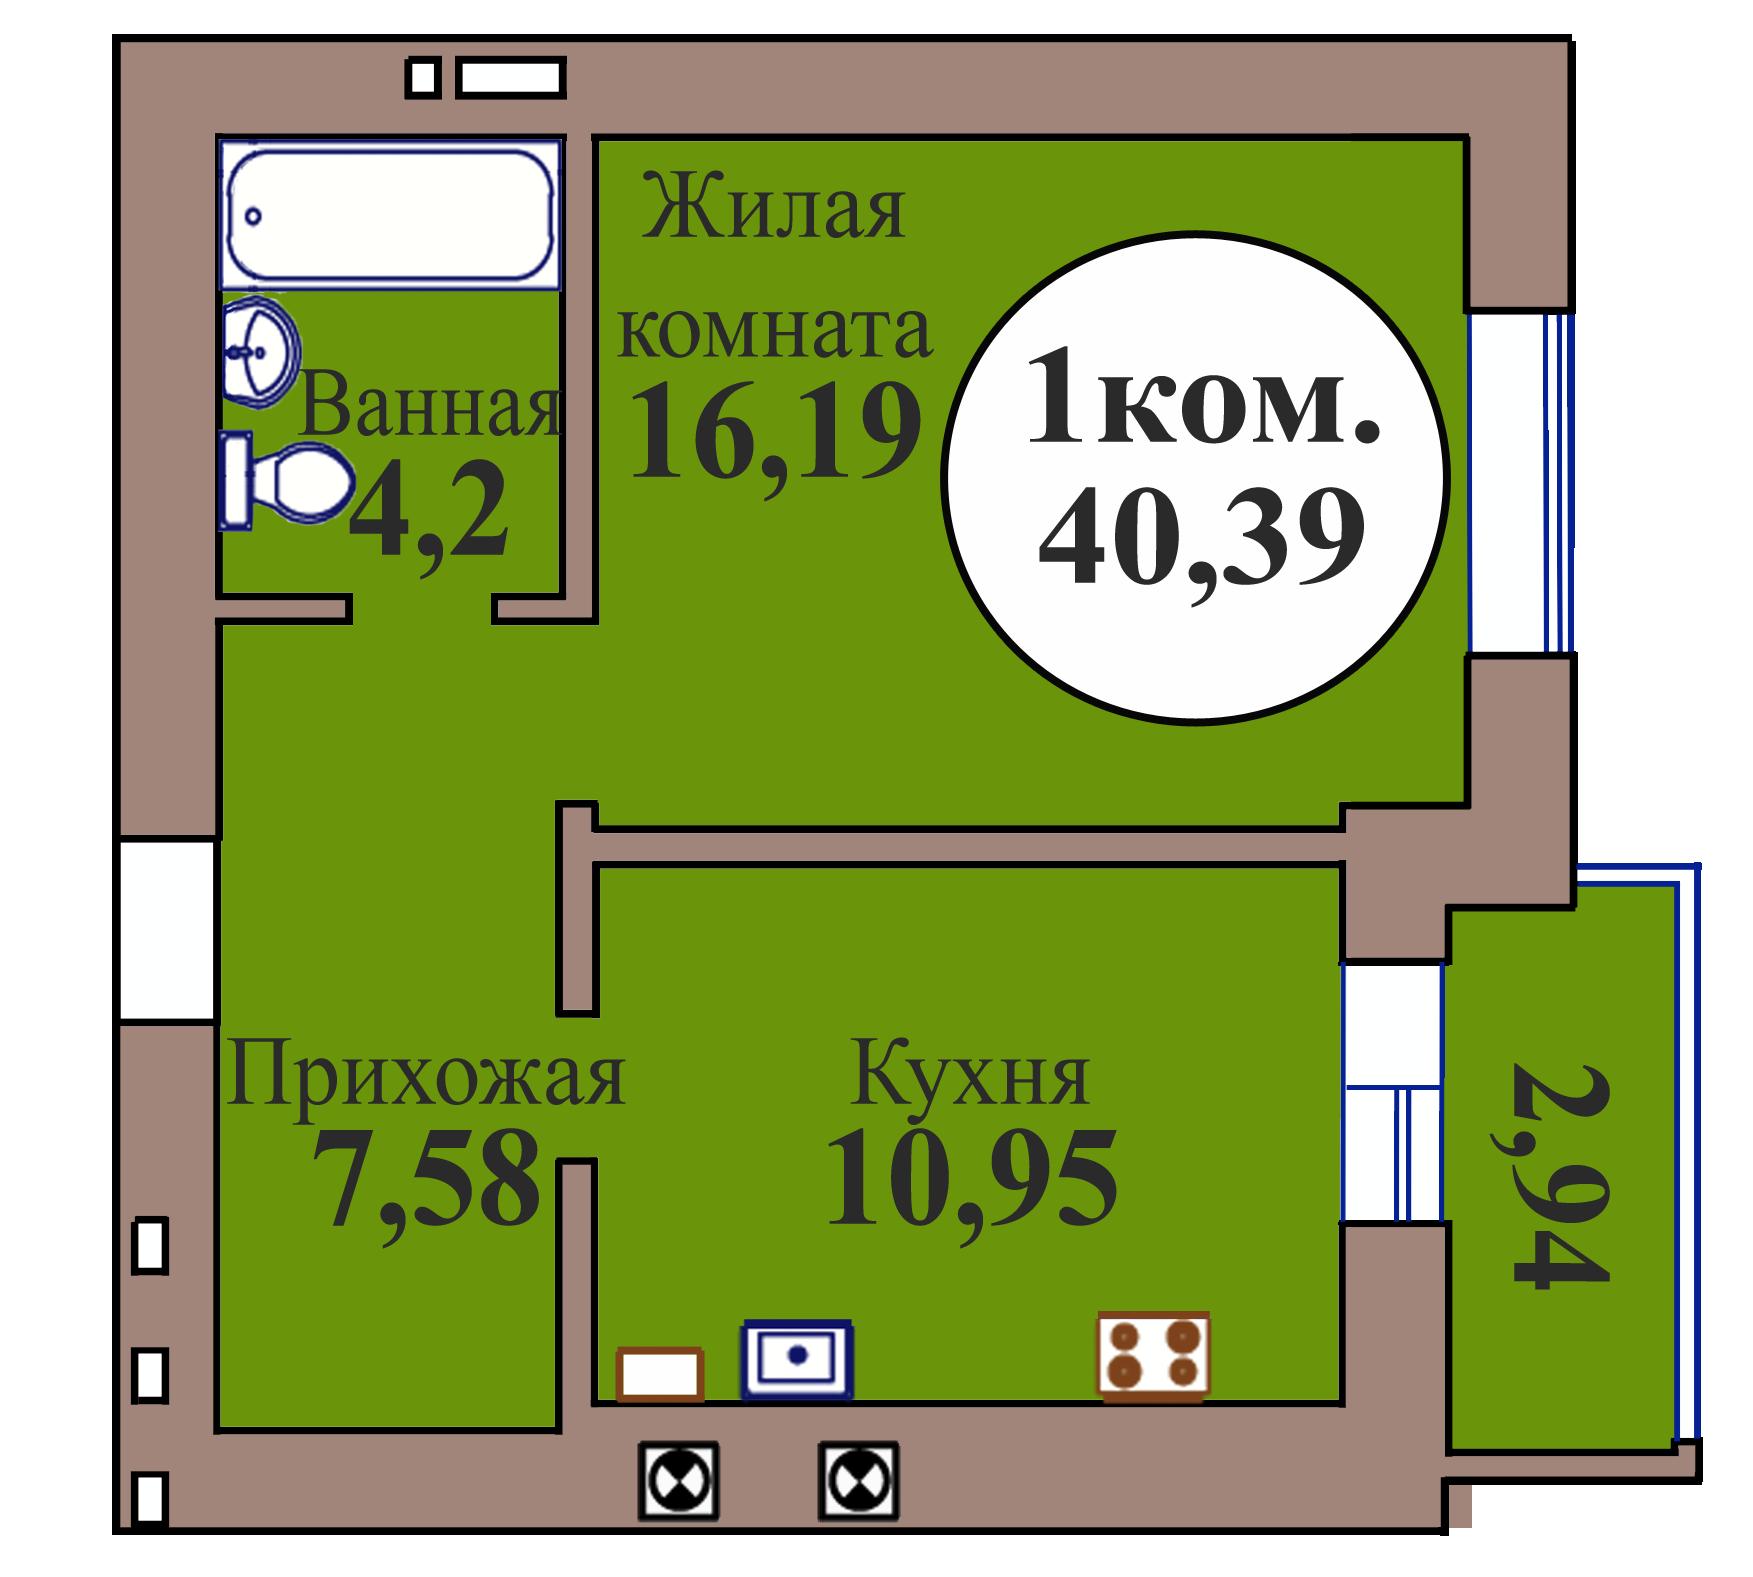 1-комн. кв. по пер. Калининградский, 5 кв. 99 в Калининграде